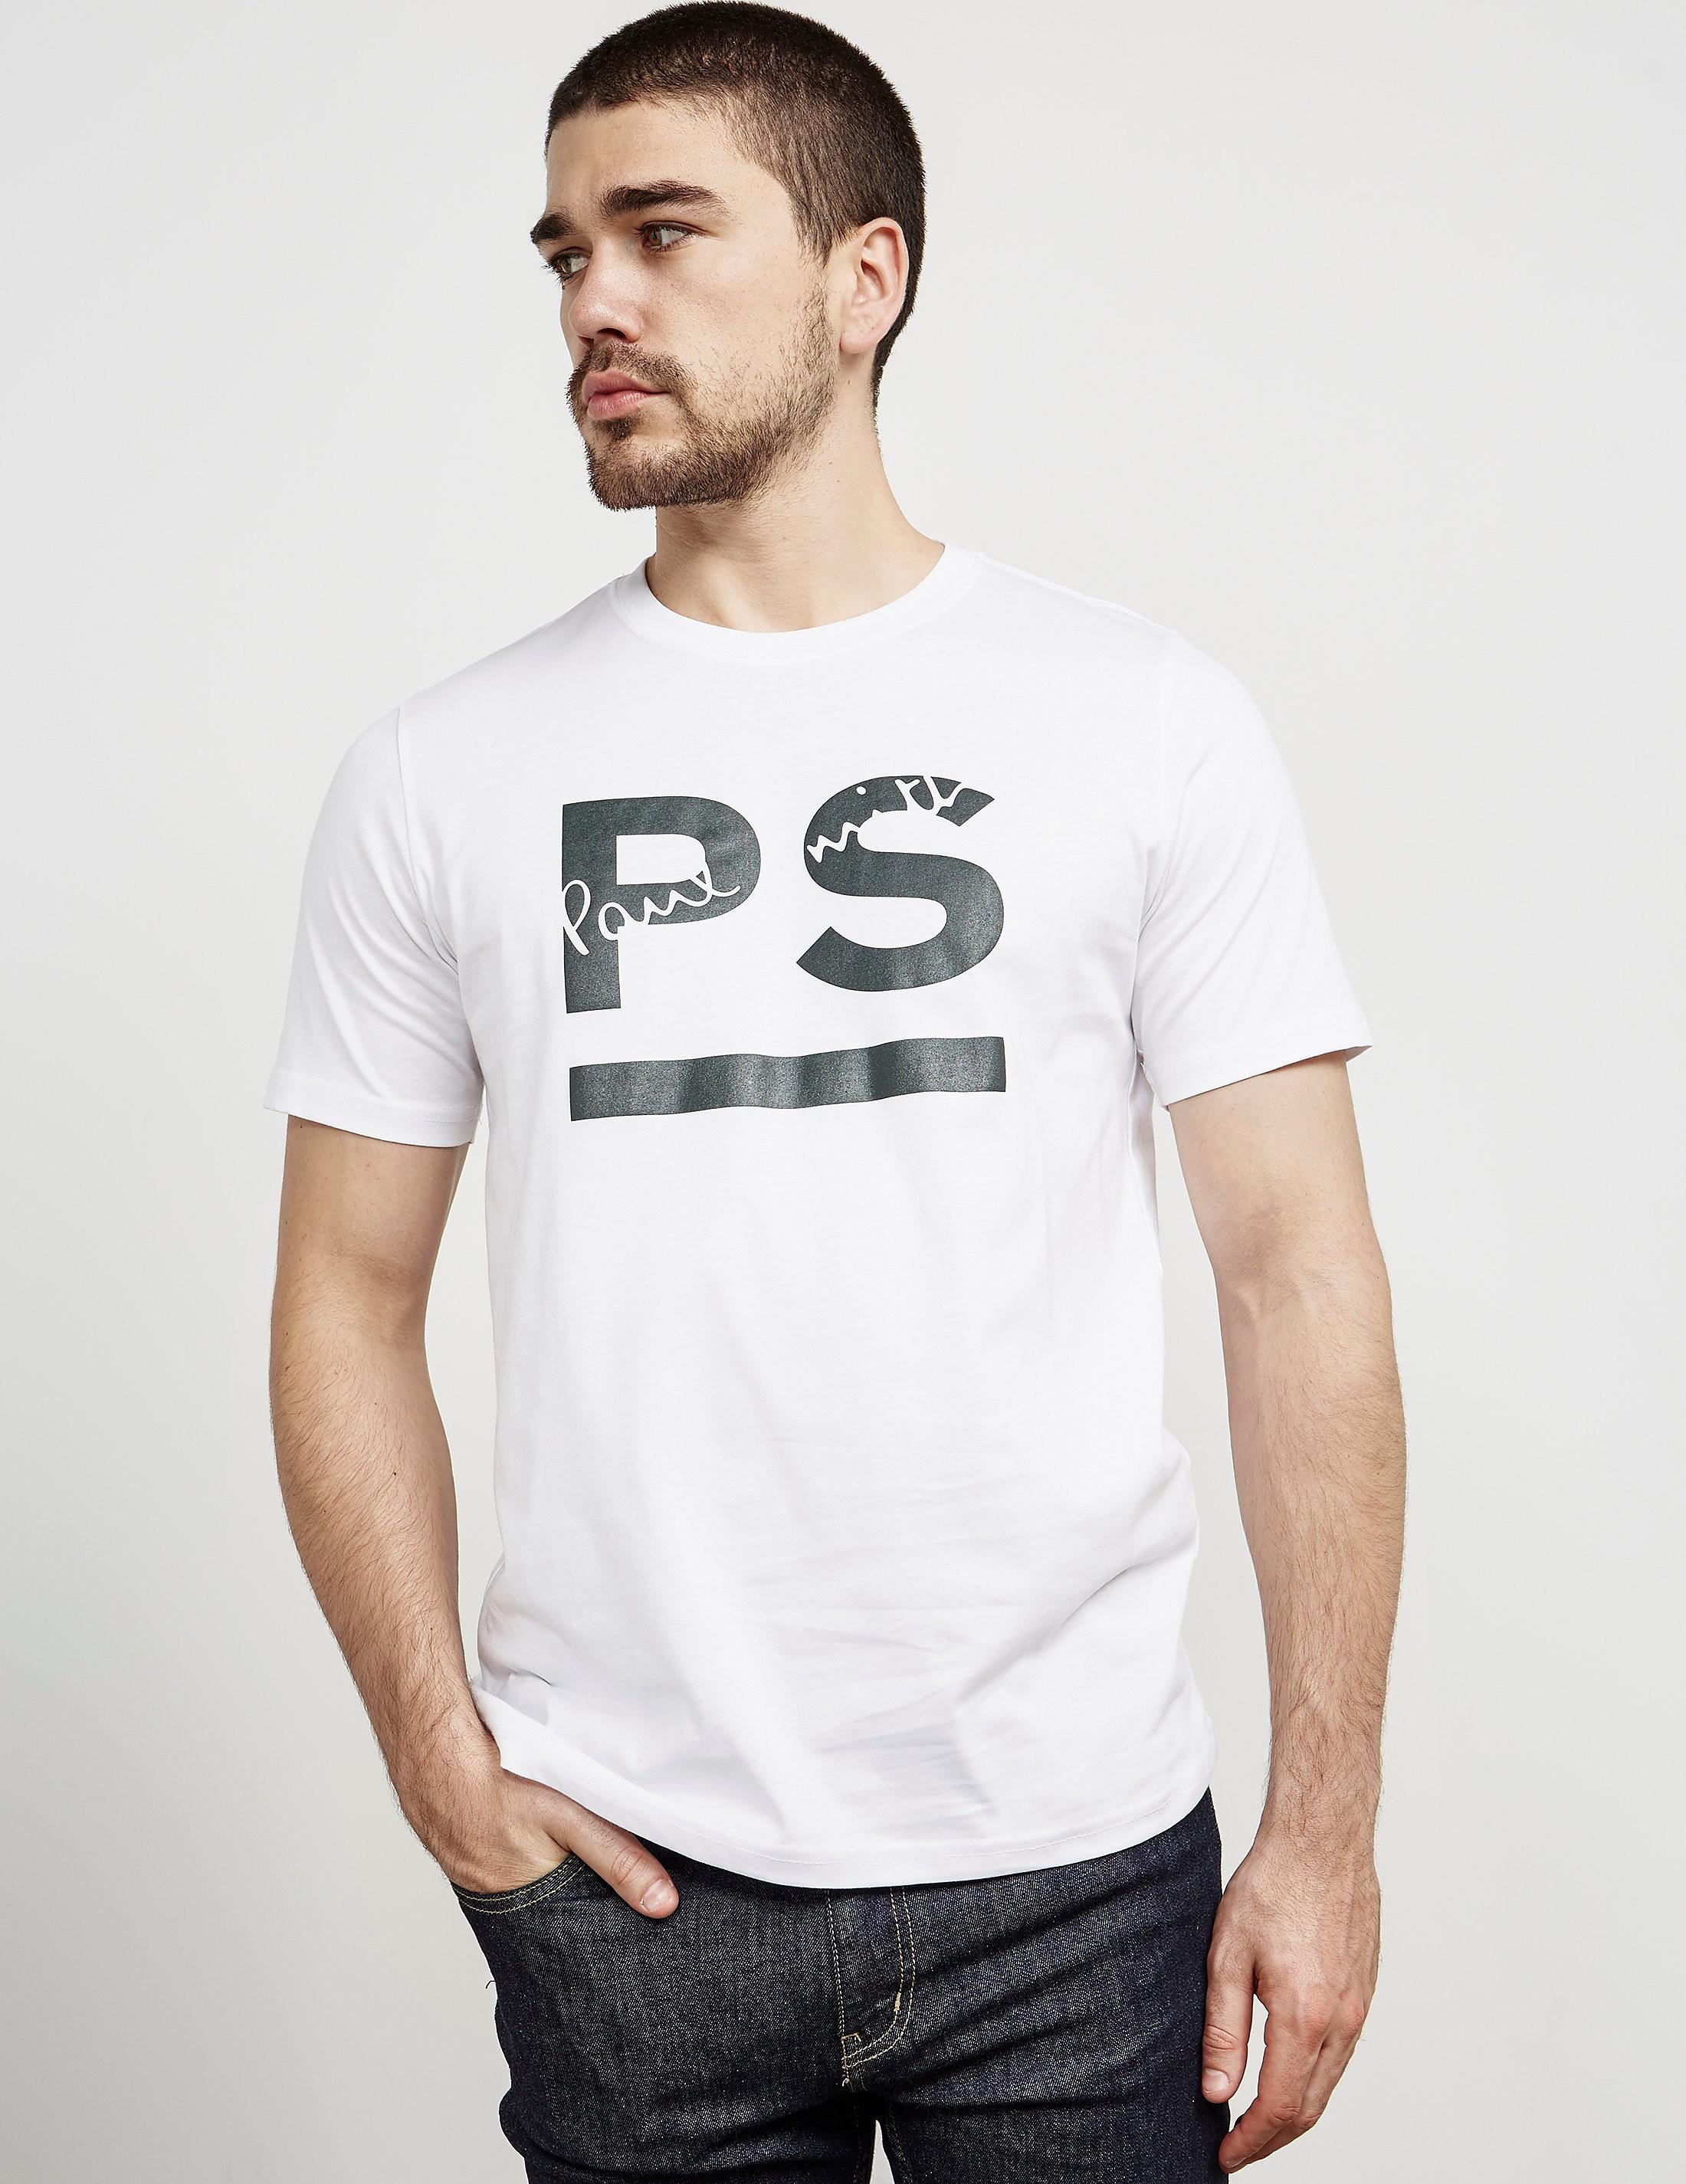 Paul Smith Underline Short Sleeve T-Shirt